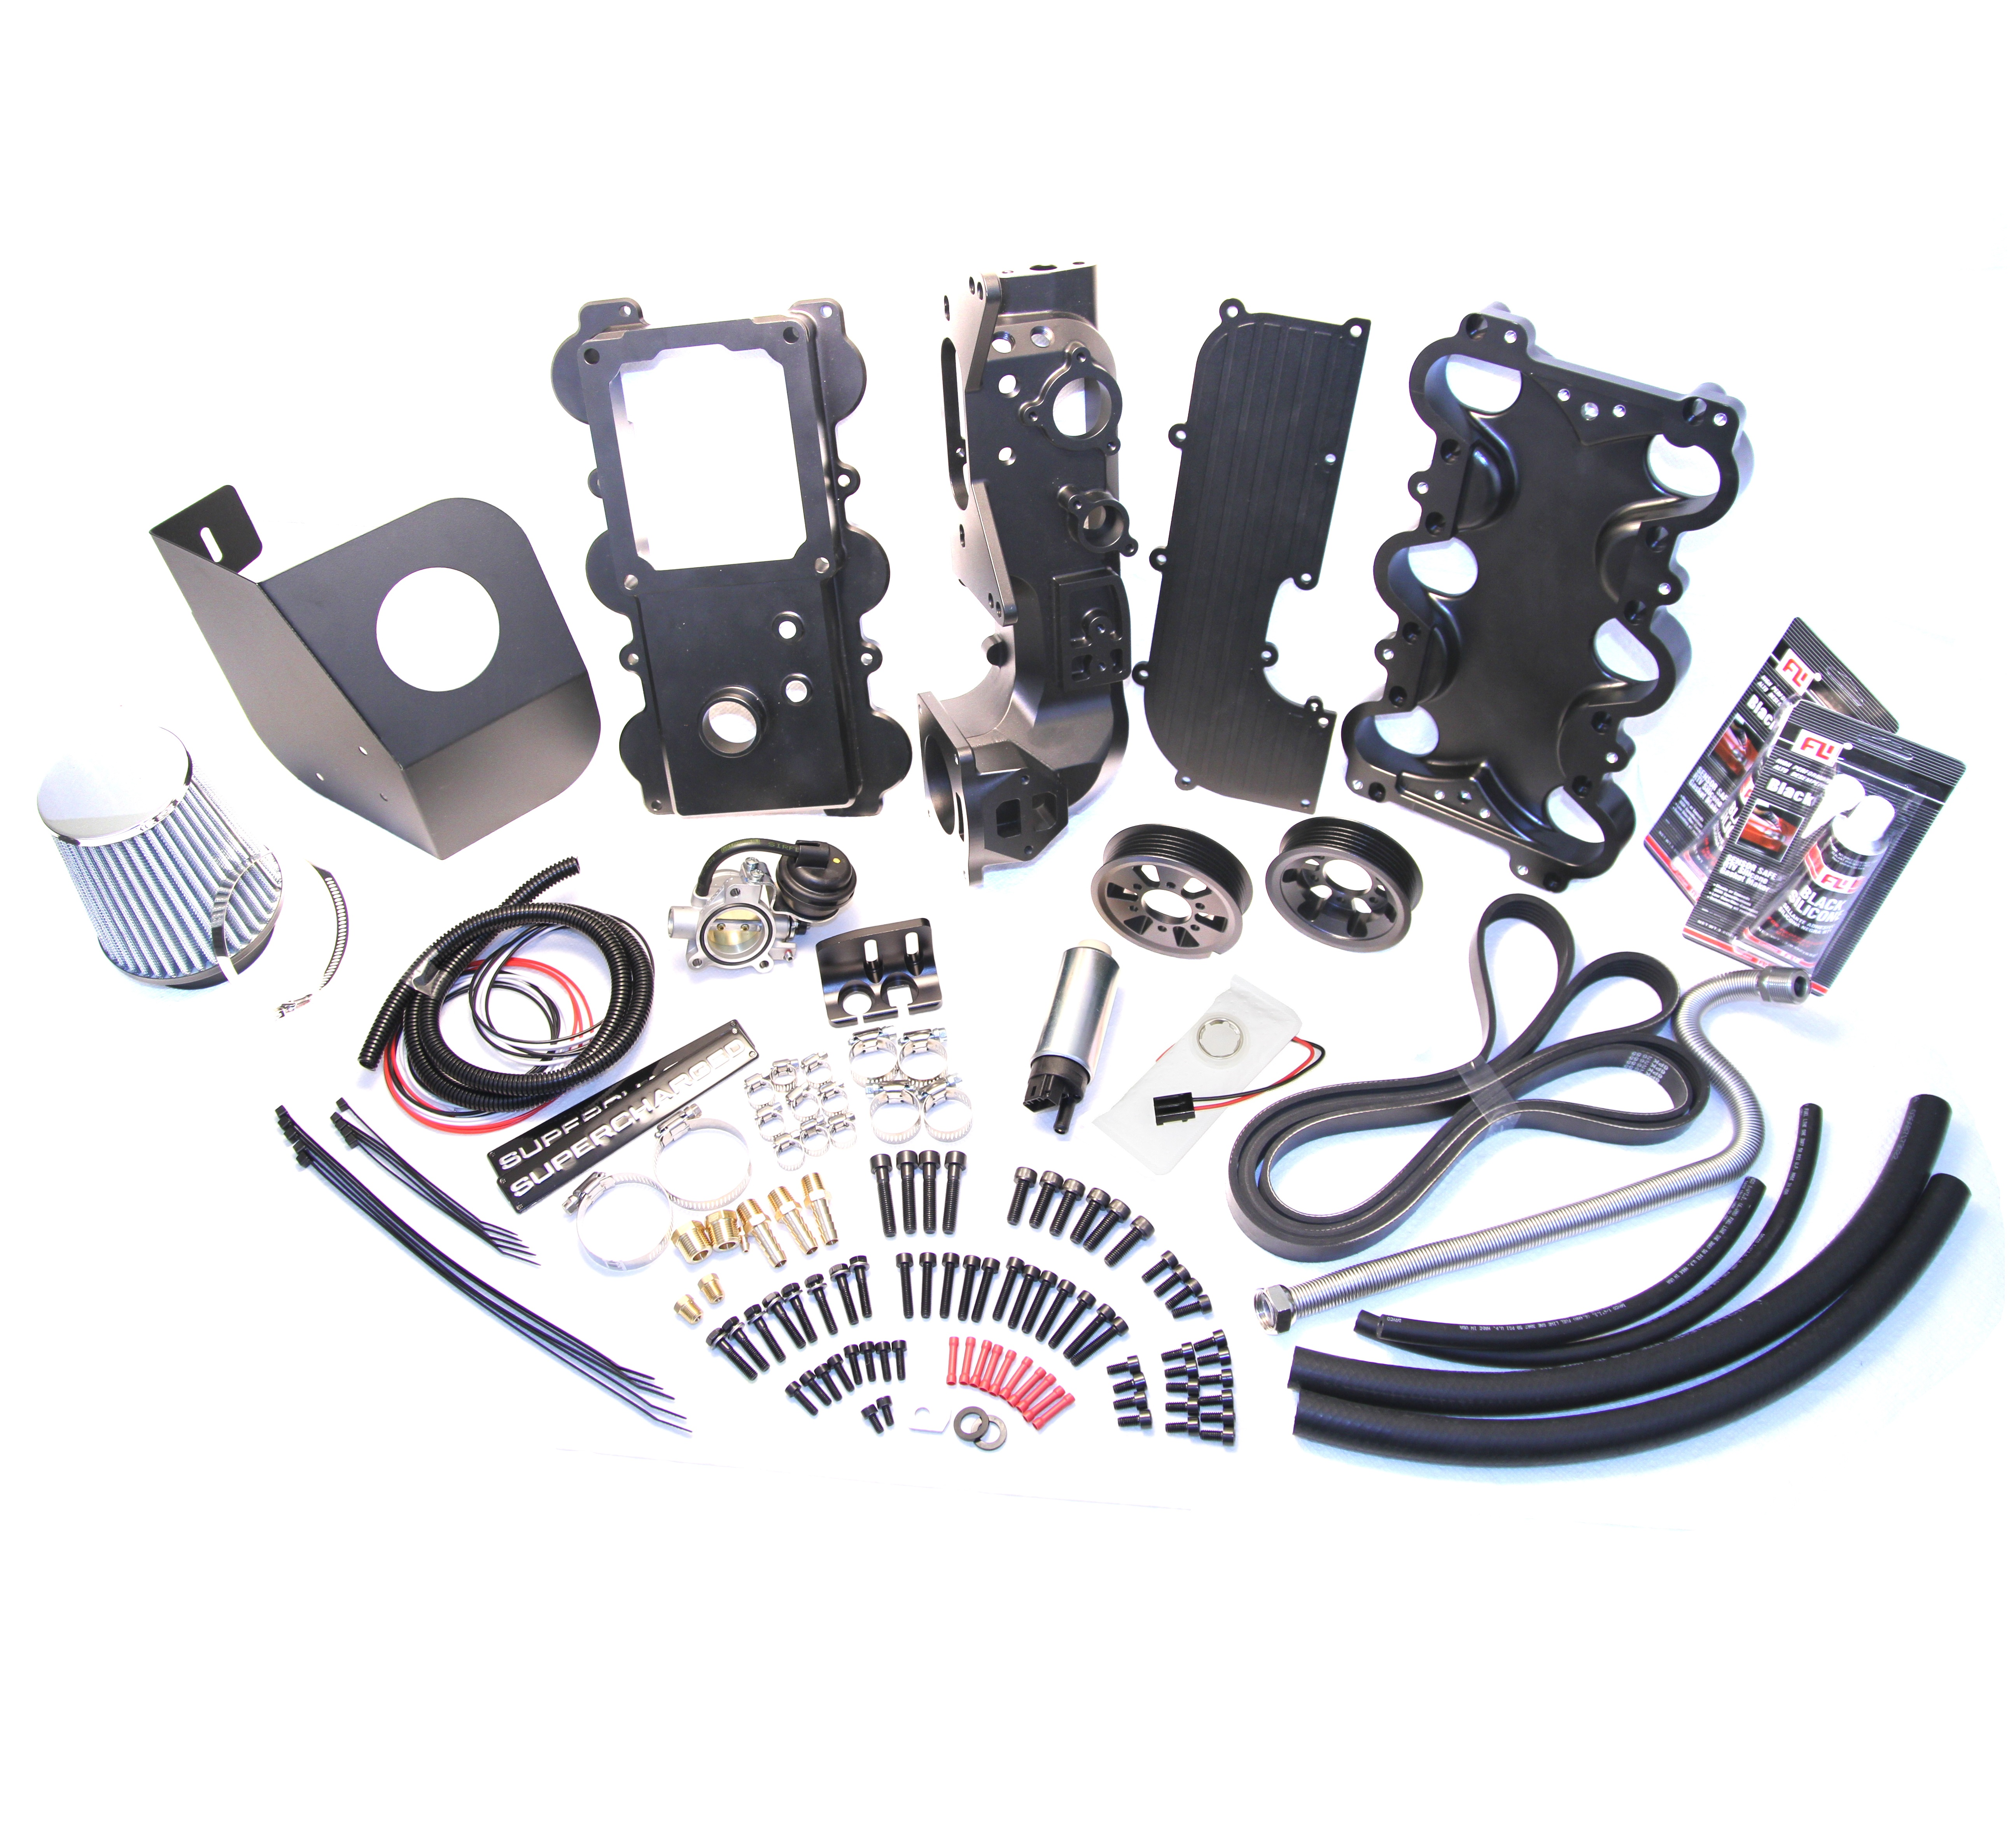 01 05 2dr Explorer St Installation Kit Moddbox 2004 Ford 4 0 Timing Chain Final 40lv6cologne